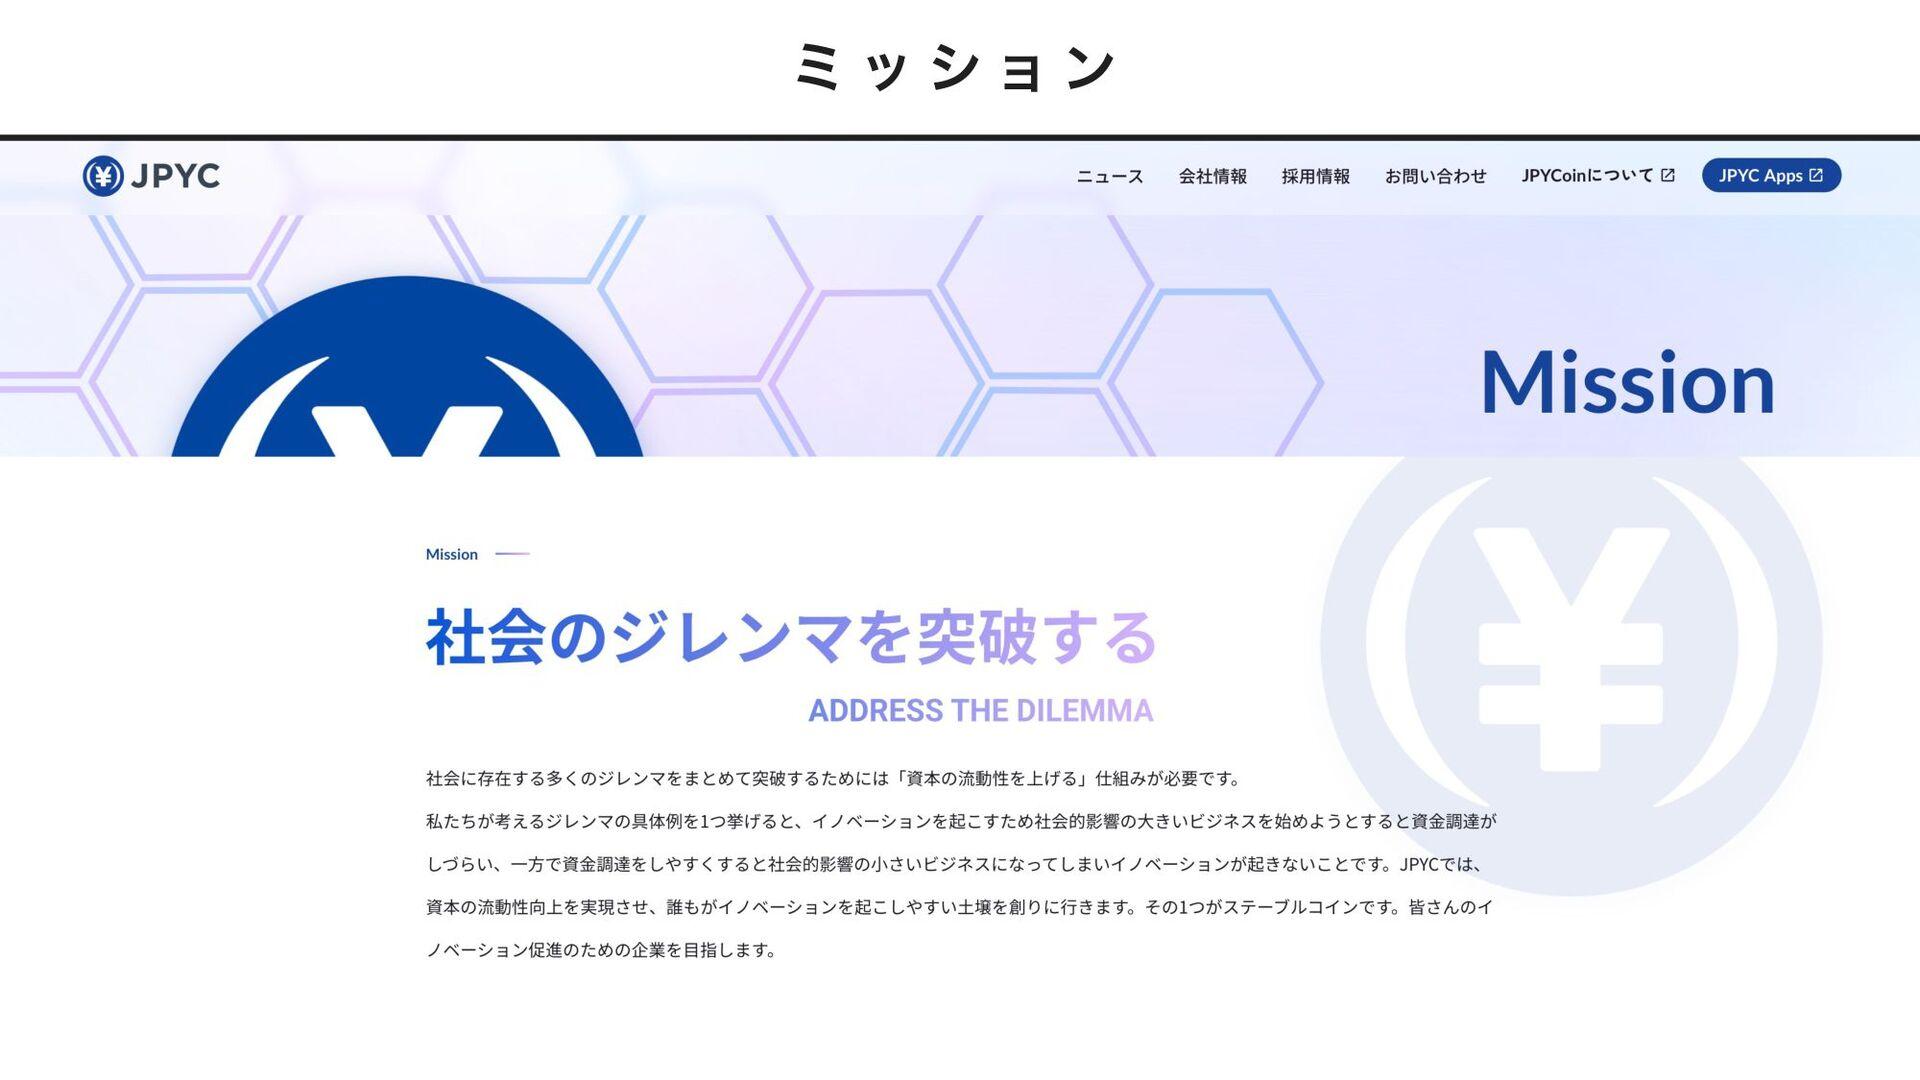 ʮ֮ޛʯΛͬͯΒ͏ͨΊͷڞϓϩηε Step 01 ·ͣࣗ༝ʹ ޠͬͯΒ͏ Step...